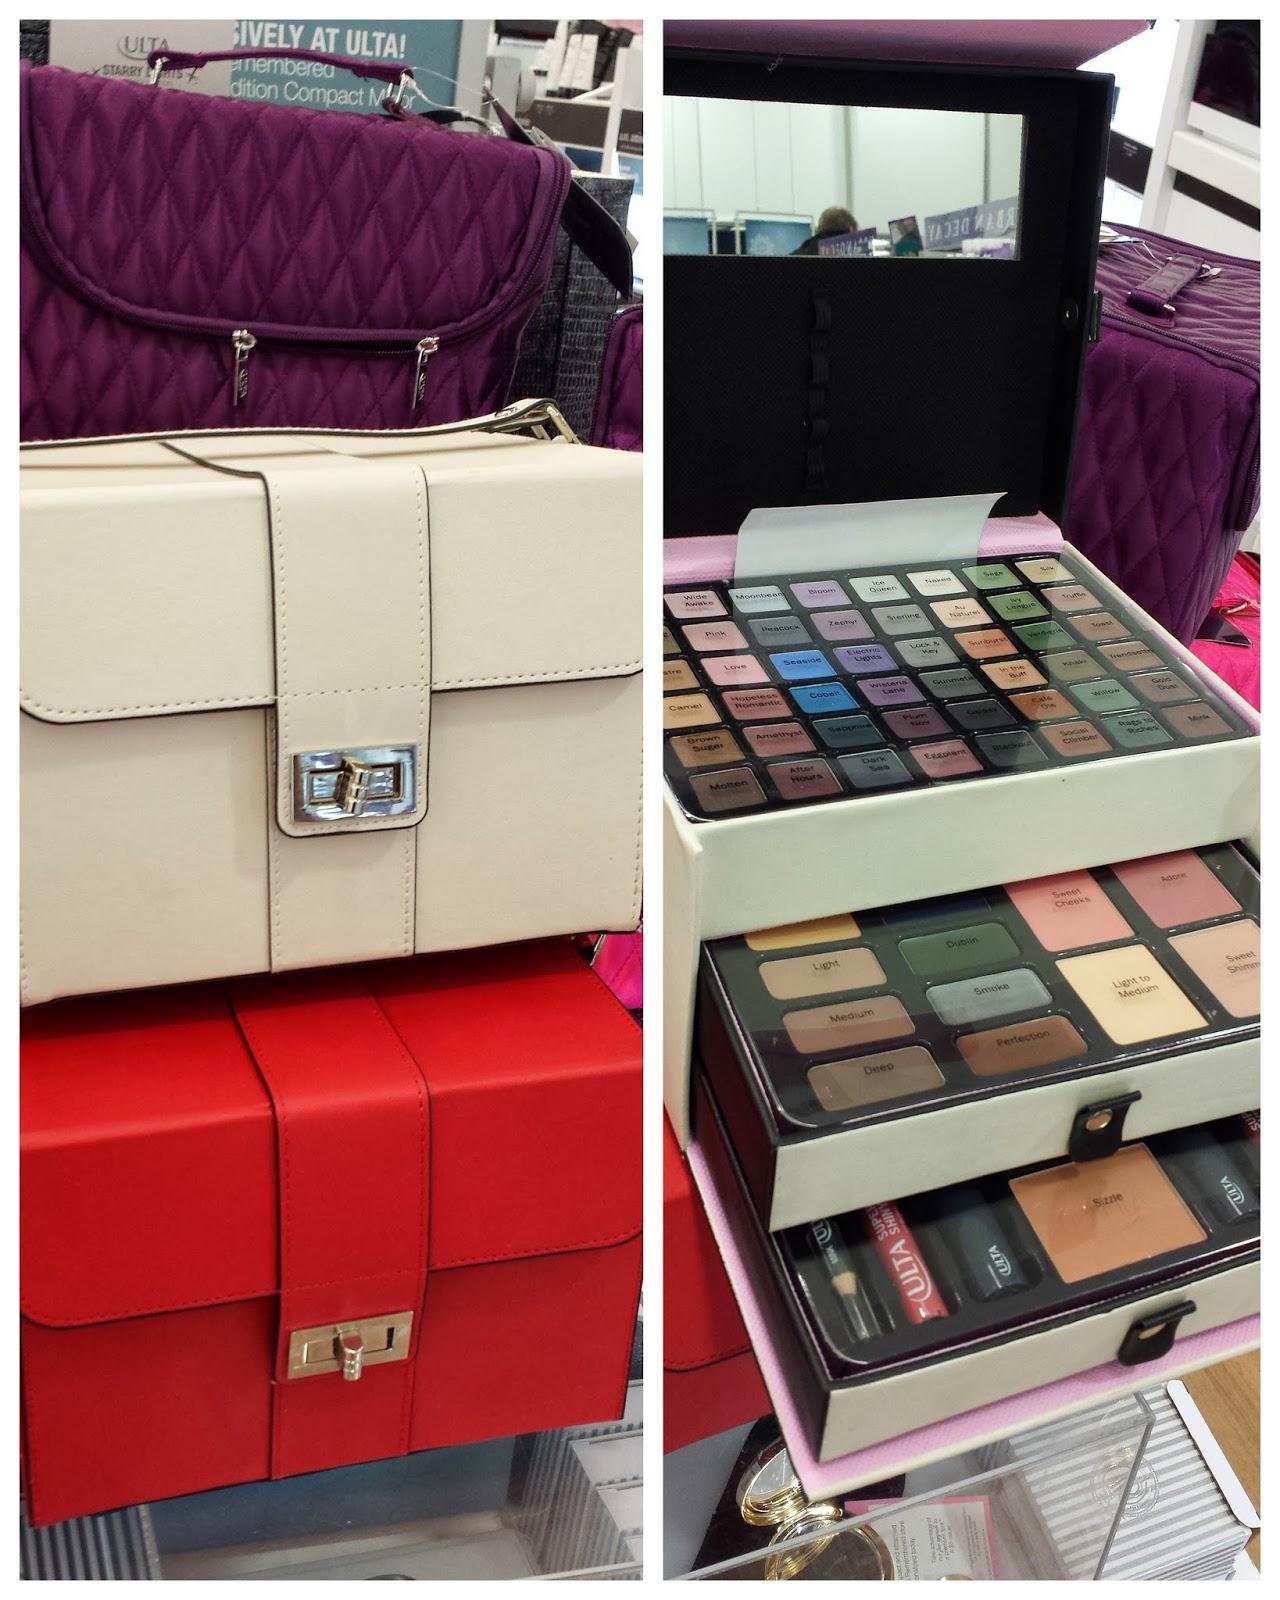 Ulta makeup case